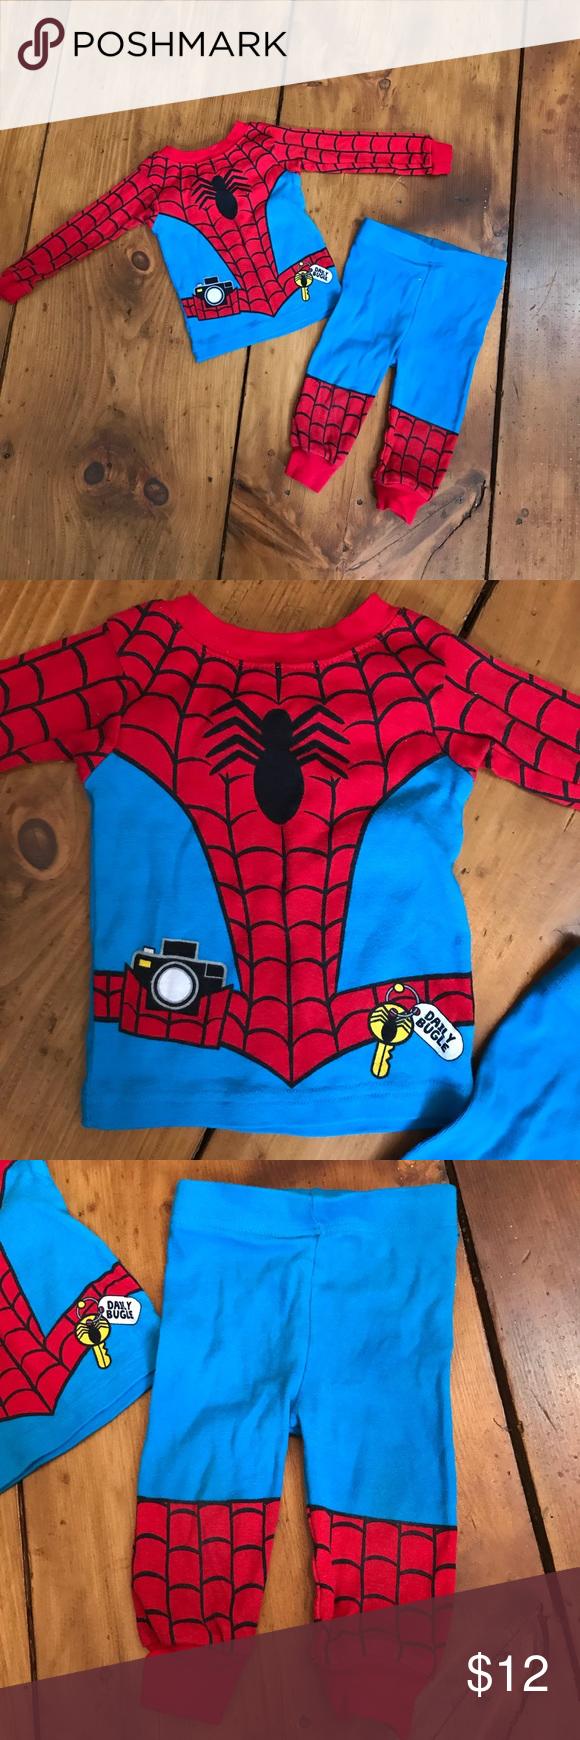 Pajama set Spiderman boys 12 months new